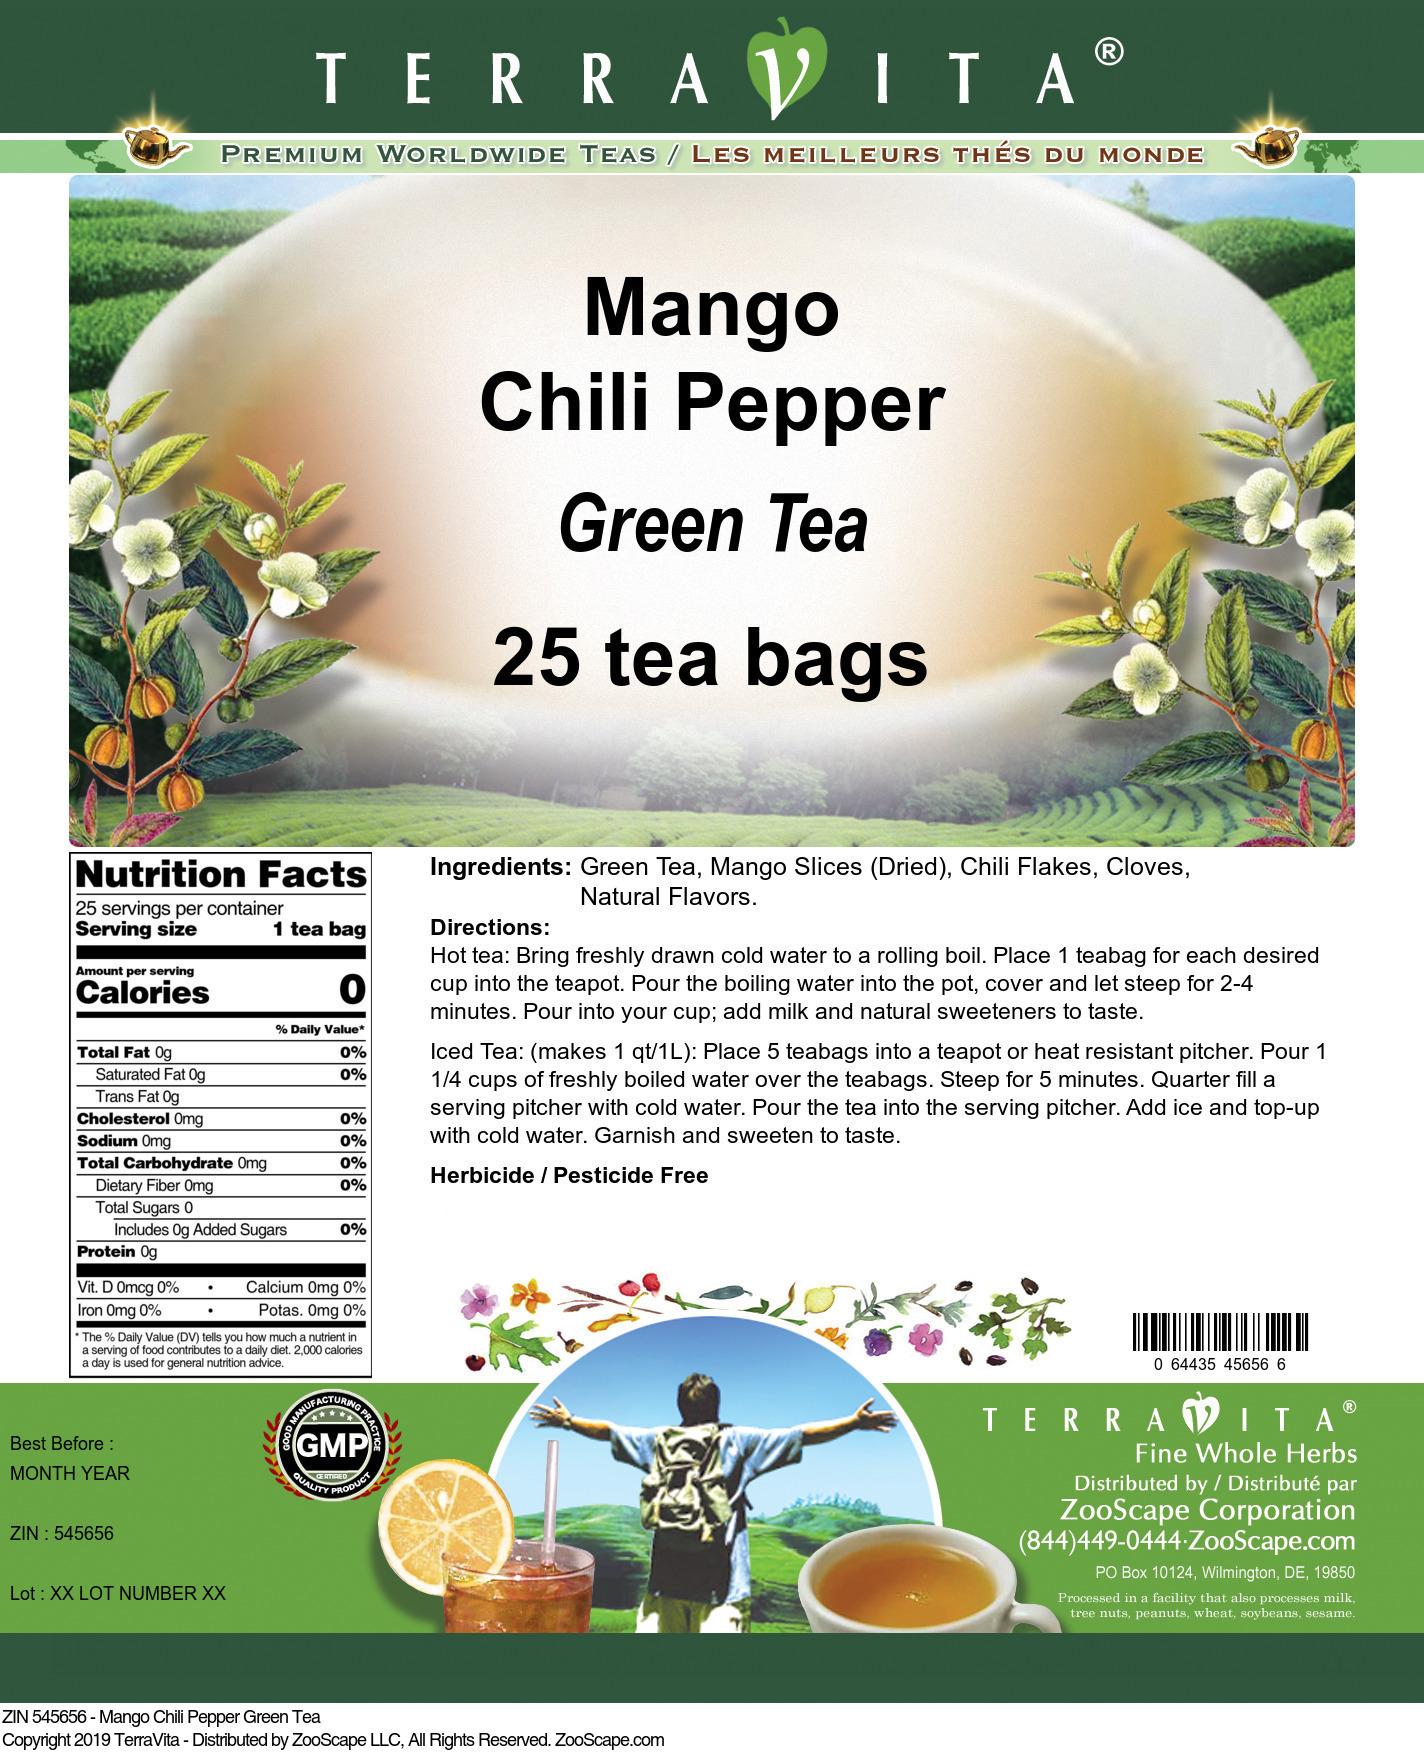 Mango Chili Pepper Green Tea